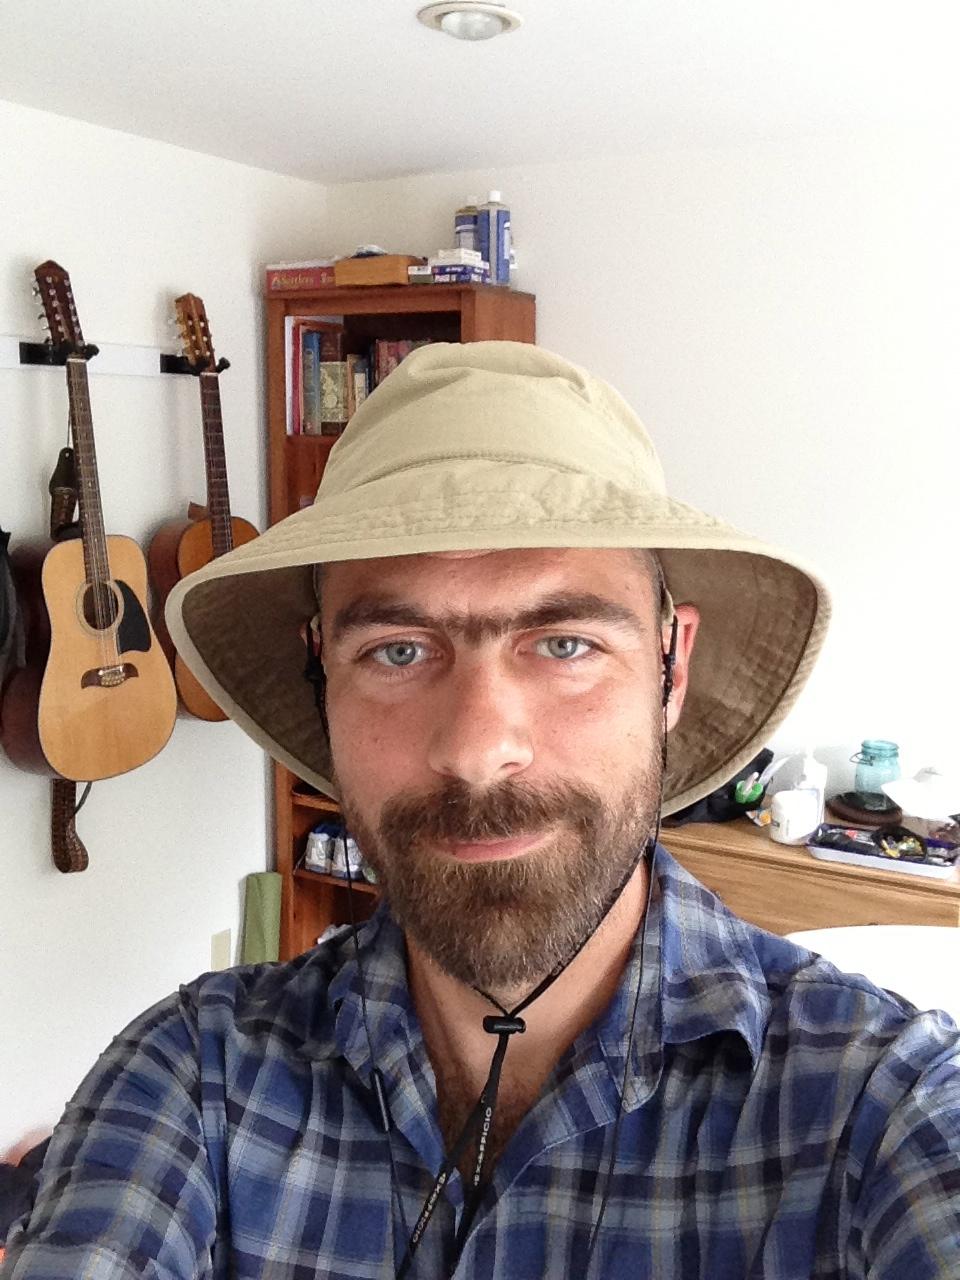 New walkin' hat and shirt